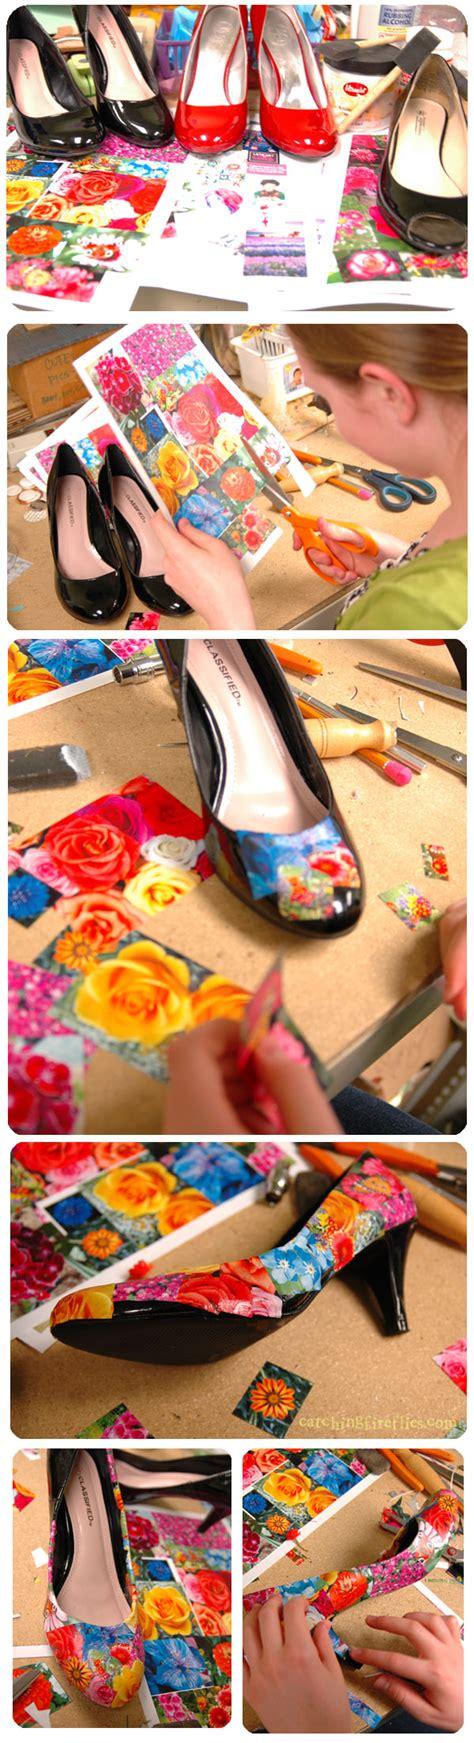 how to decoupage shoes how to decoupage shoes creative gift ideas news at